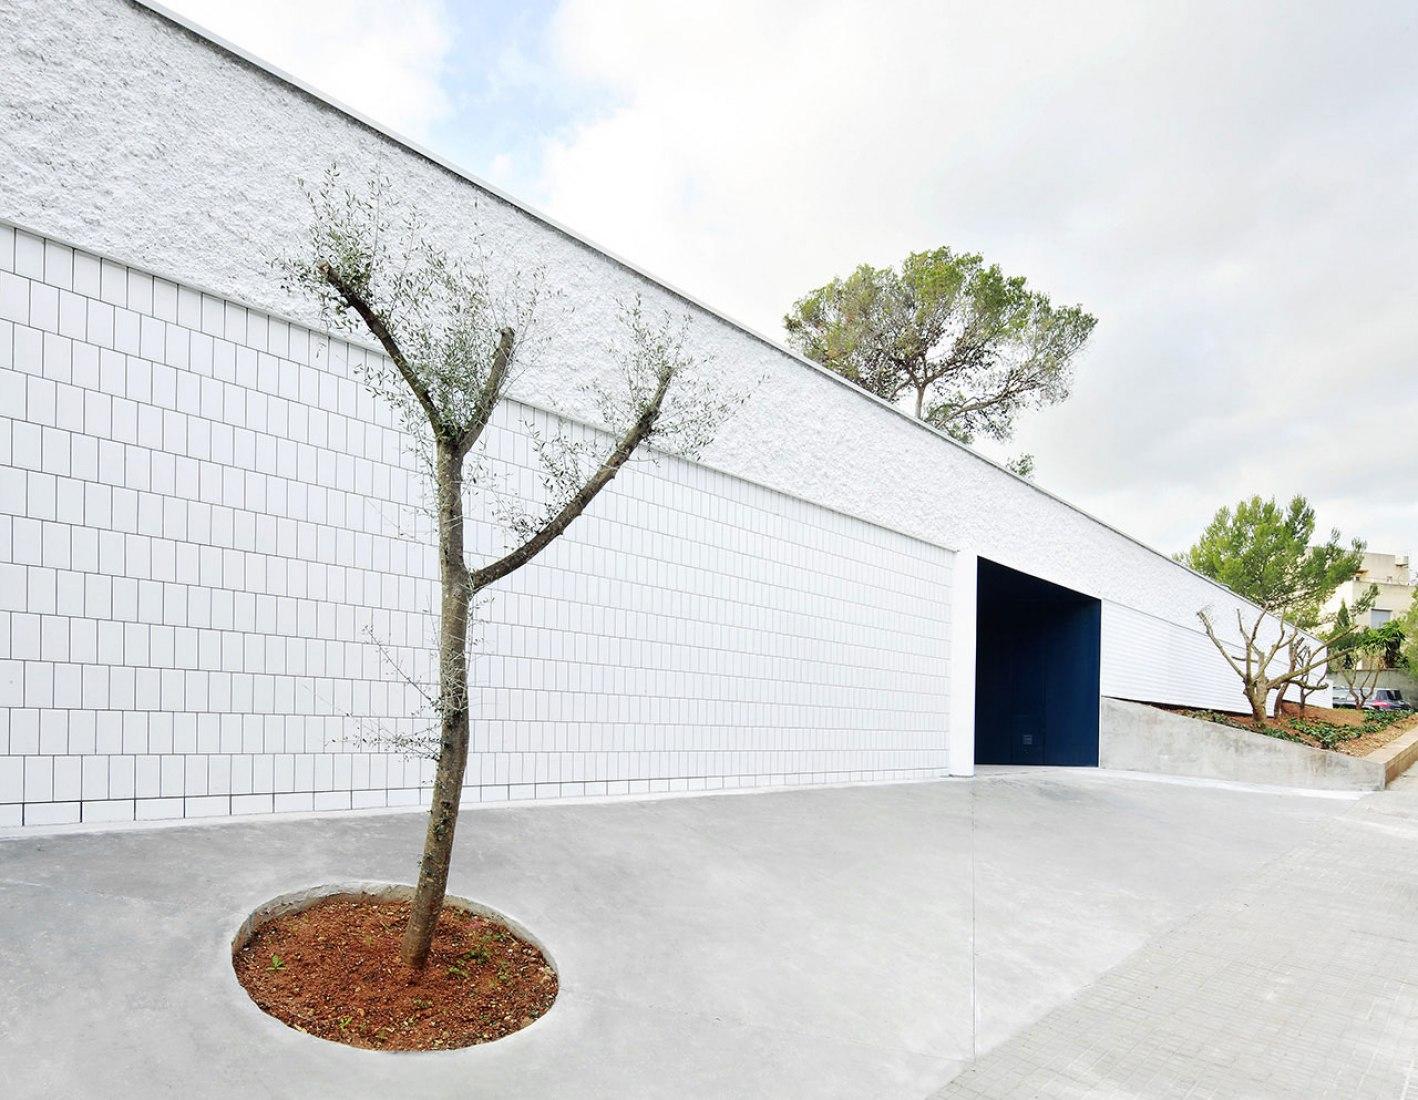 Flexo Arquitectura: Centro de día y actividades comunitarias. Fotografía © José Hevia.